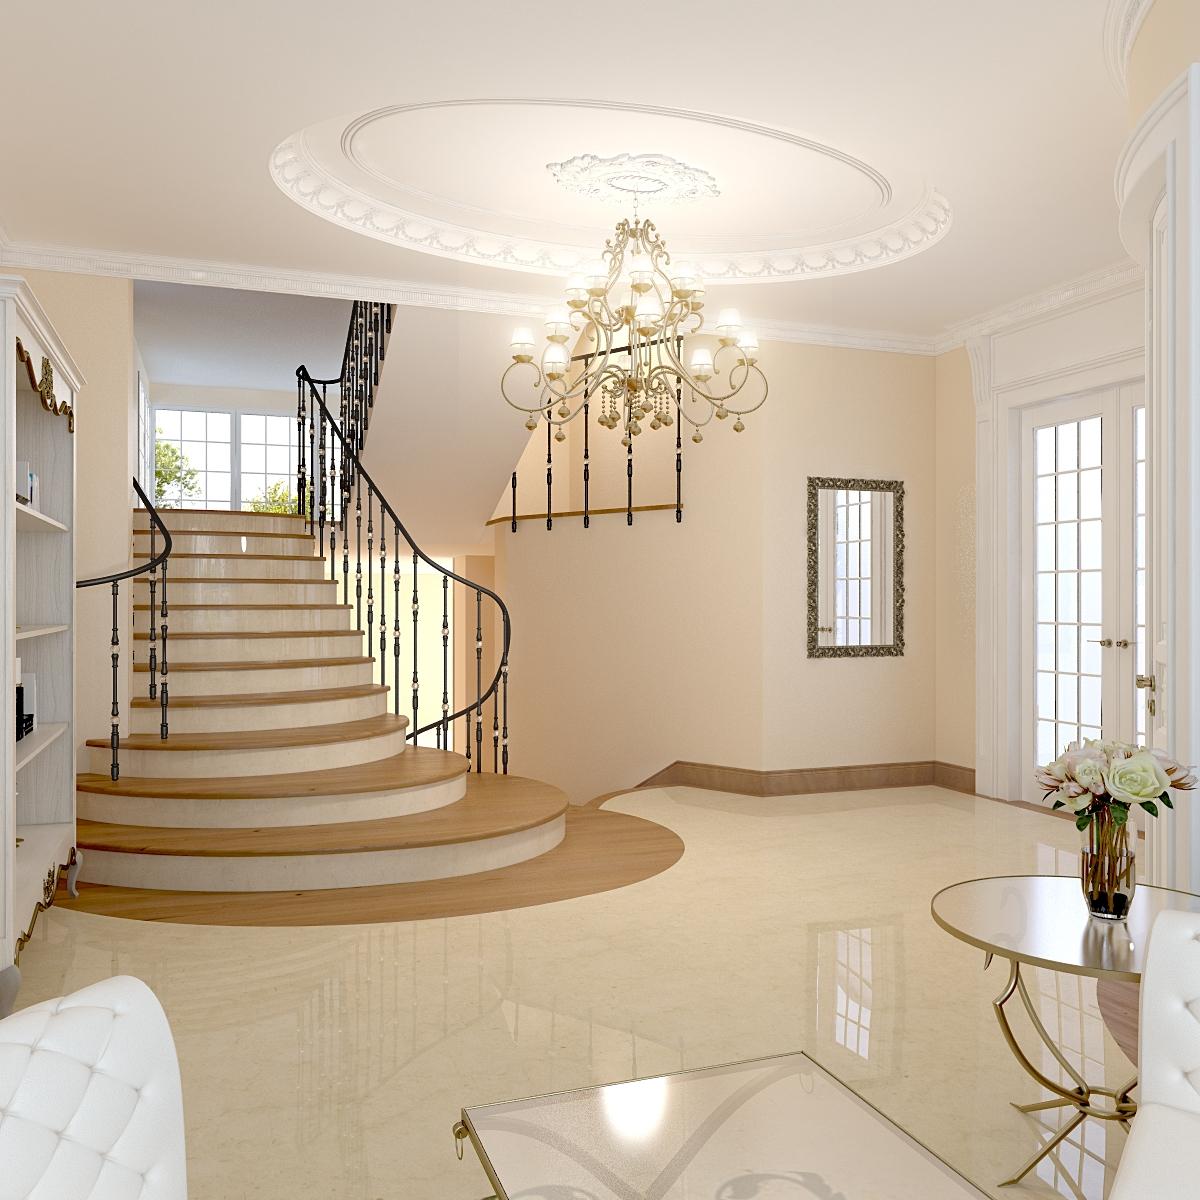 мир снизу дизайн холла в частном доме фото подвеска